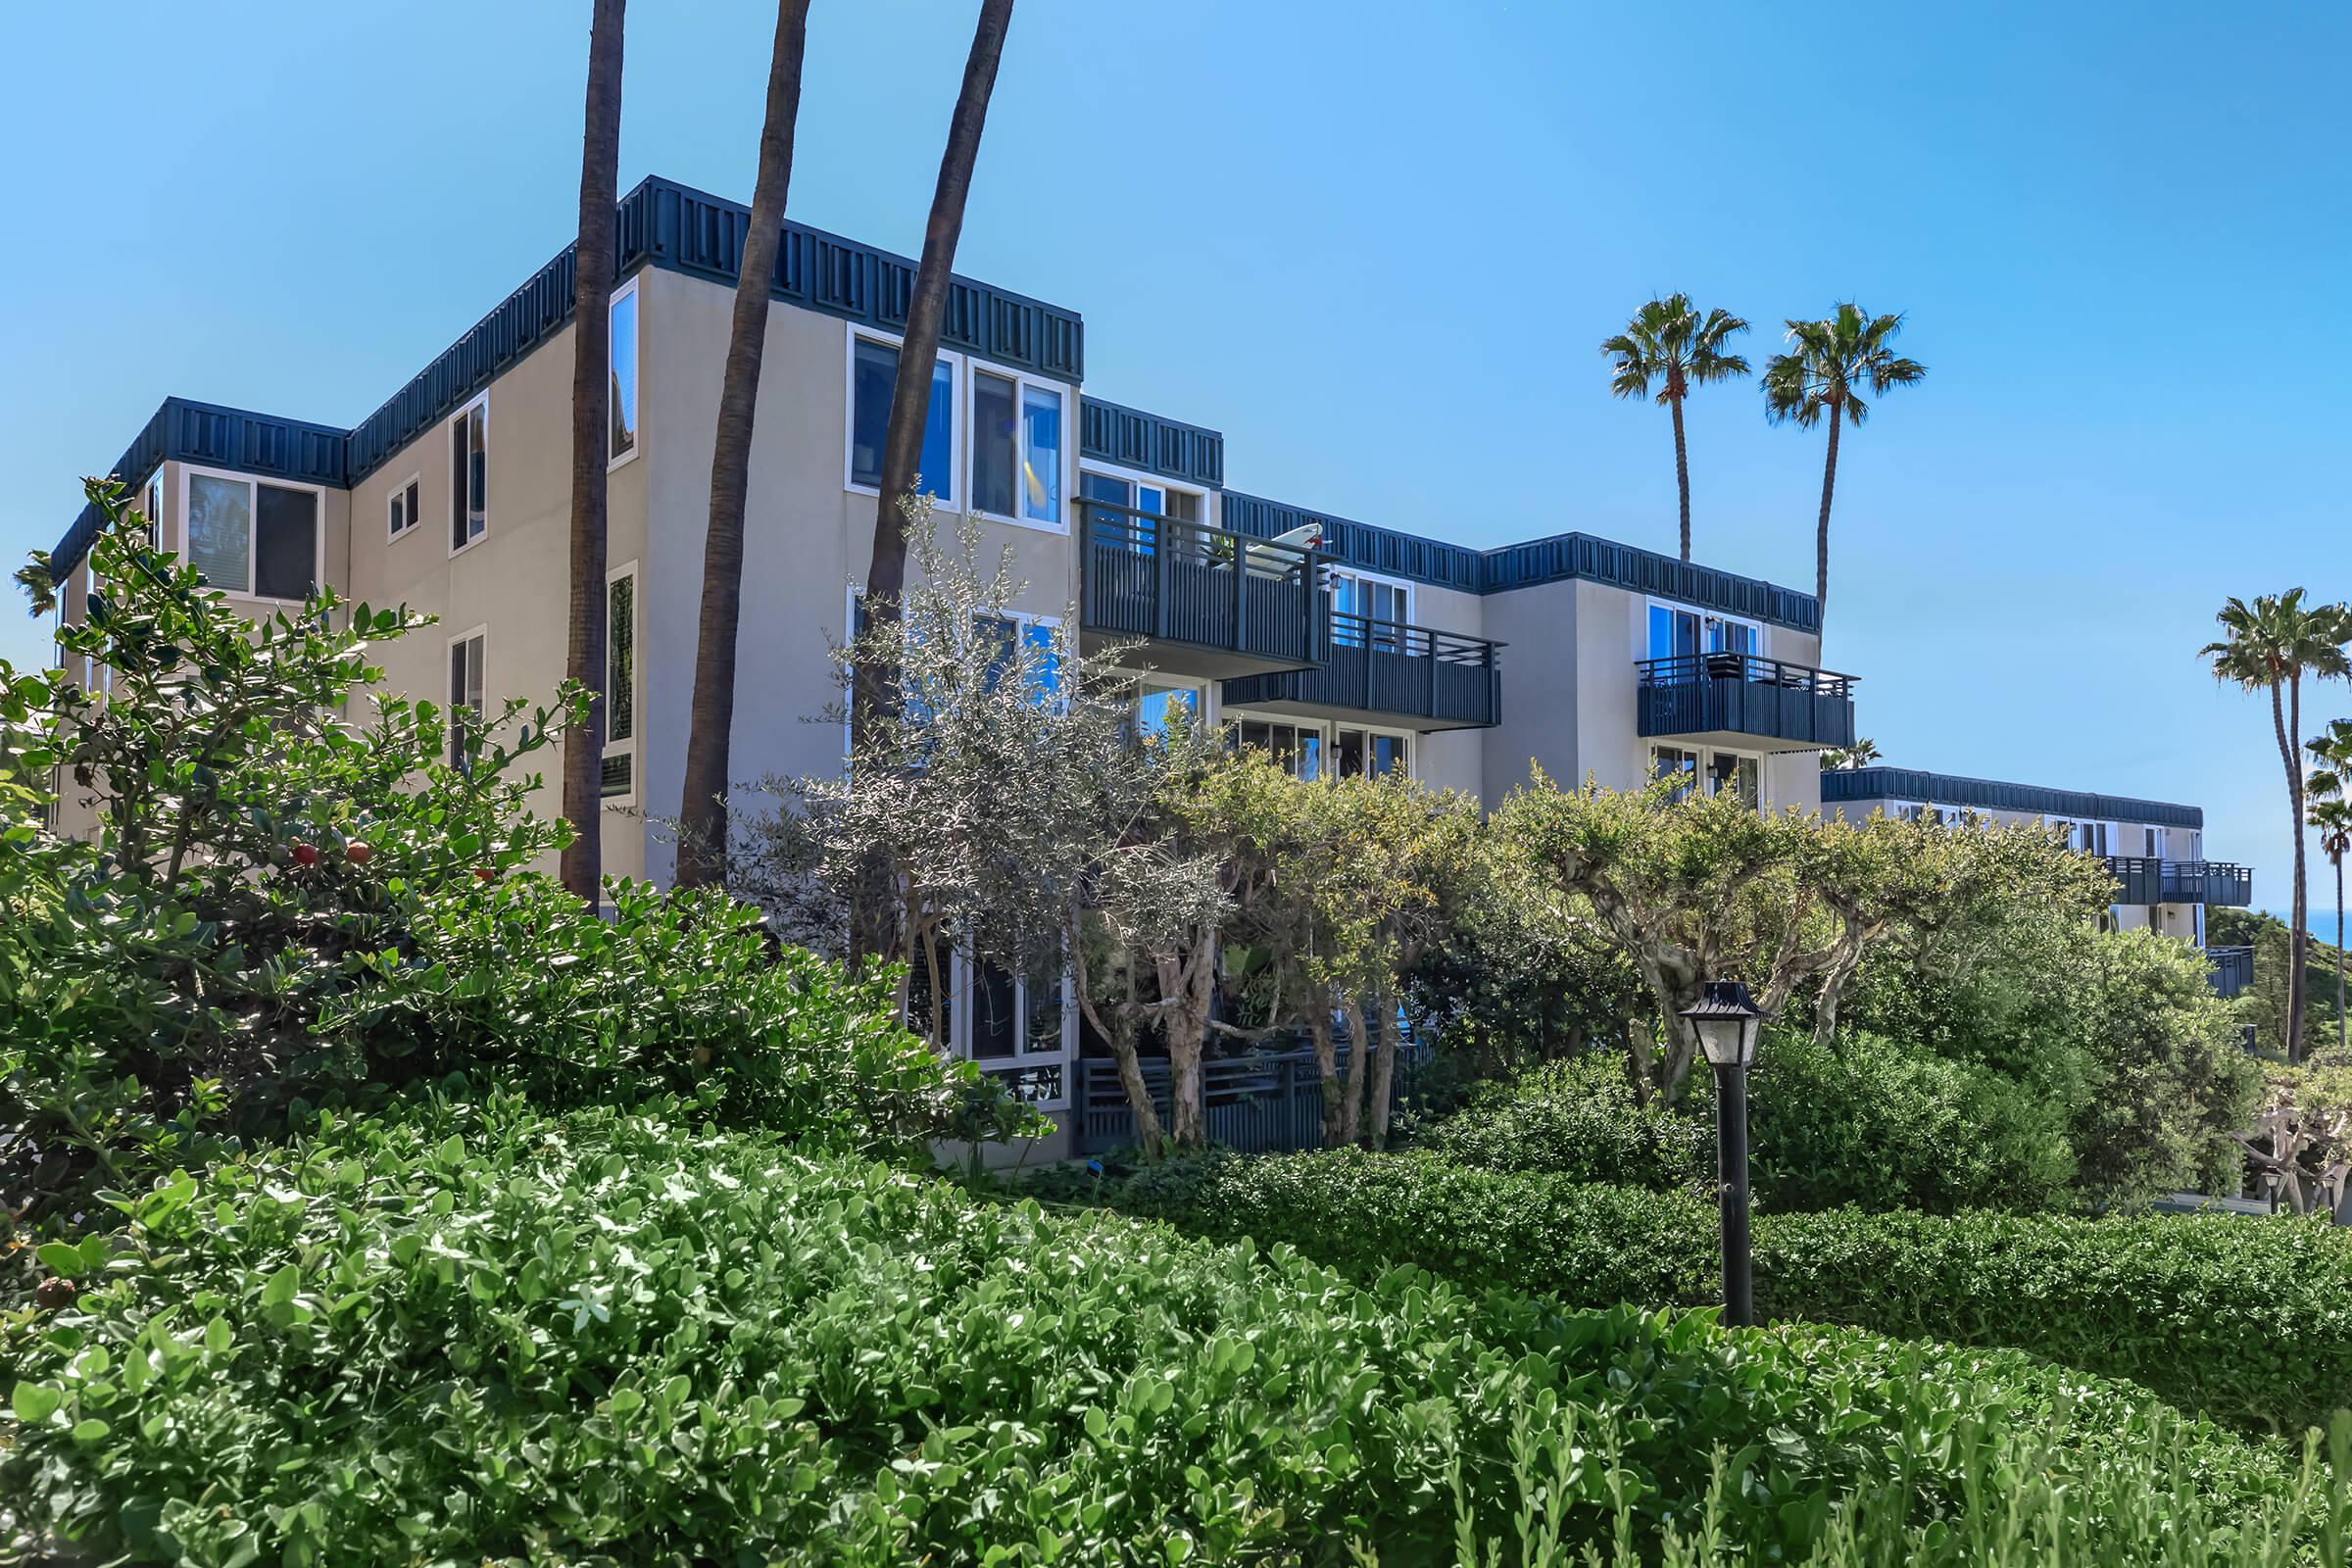 Casa Del Sur is a stunning community in San Diego, CA